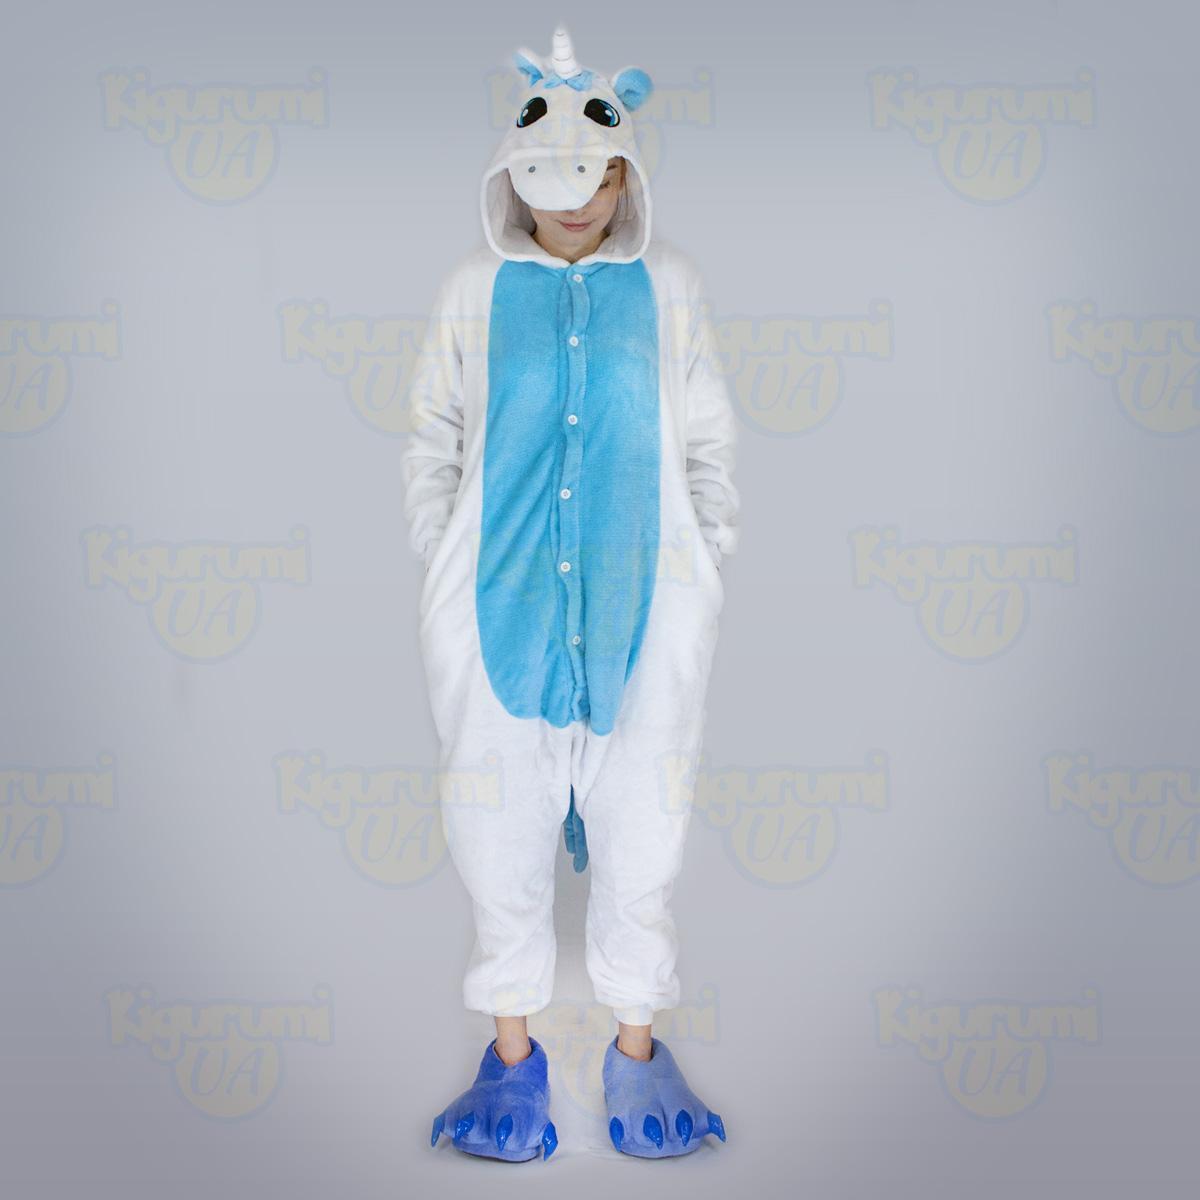 кигуруми, кигуруми единорог, пижама комбинезон купить украина, пижама комбинезон киев, кингуруми, костюм для сноуборда, пижама стич, новогодняя пижама, пижама комбинезон для взрослых украина, пижама пикачу, пижама в виде животных, лонгслив купить